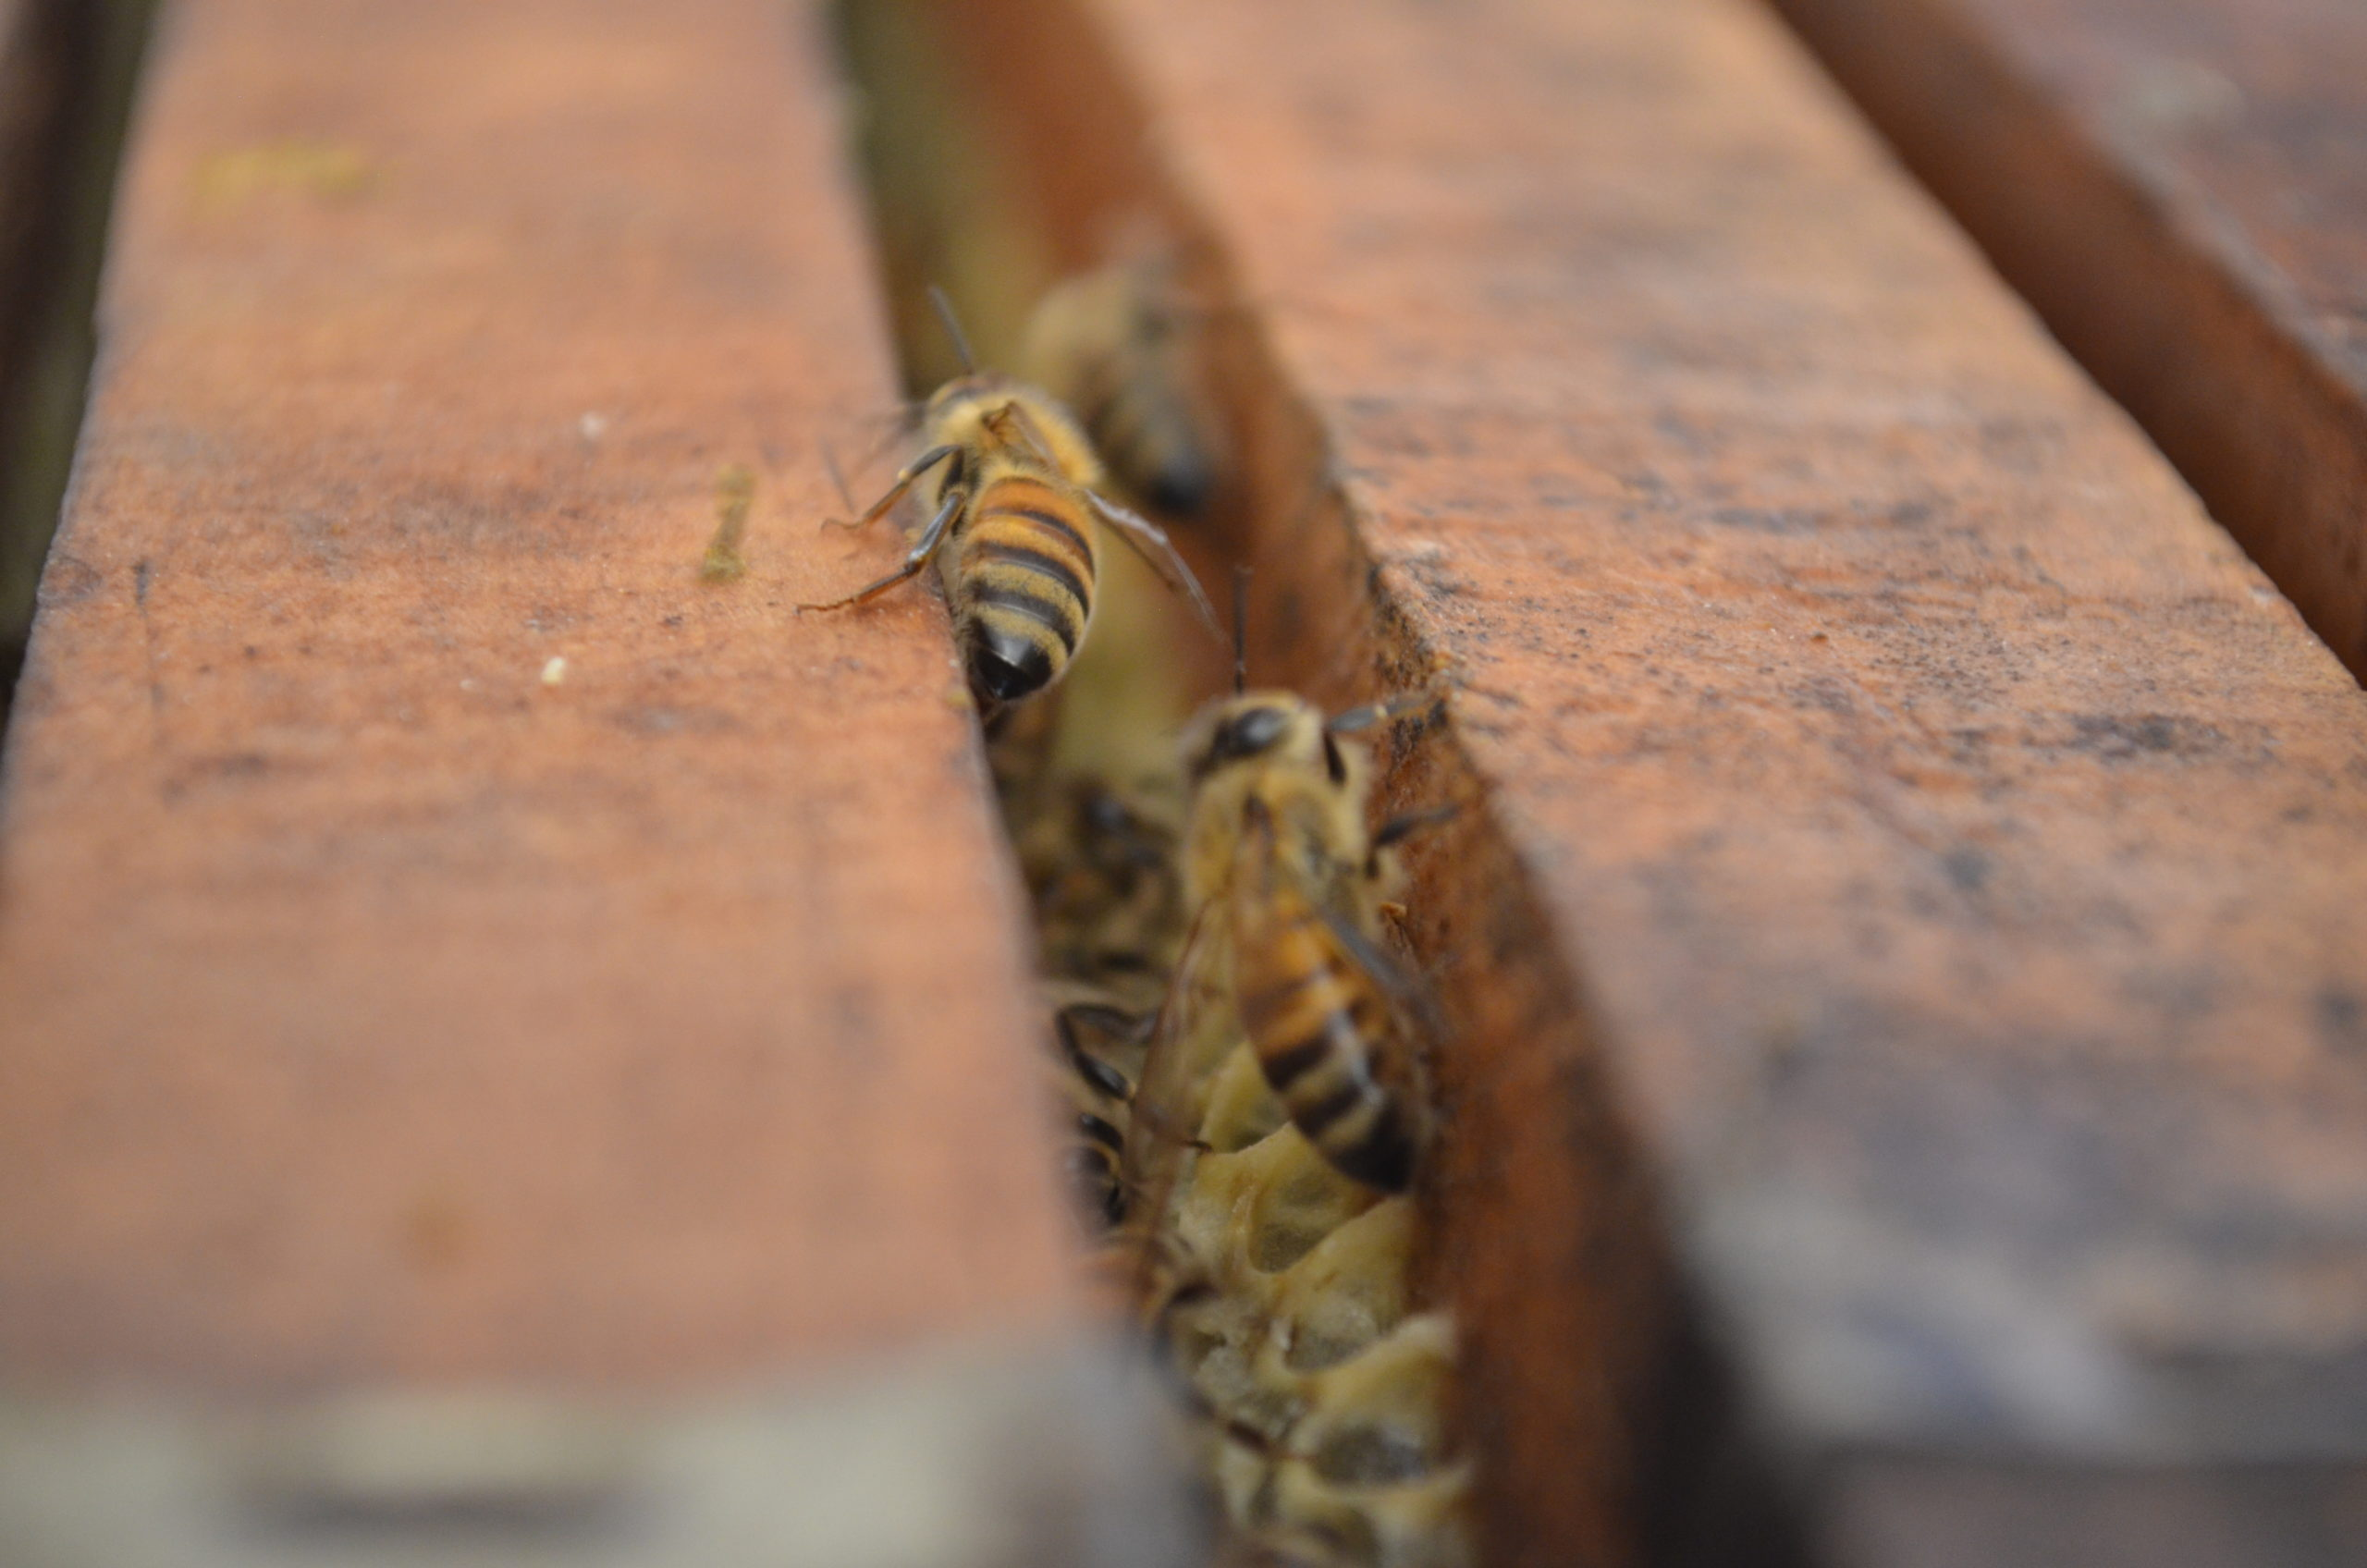 Se conforma con éxito la primera cooperativa exclusiva de apicultores orgánicos de Chile